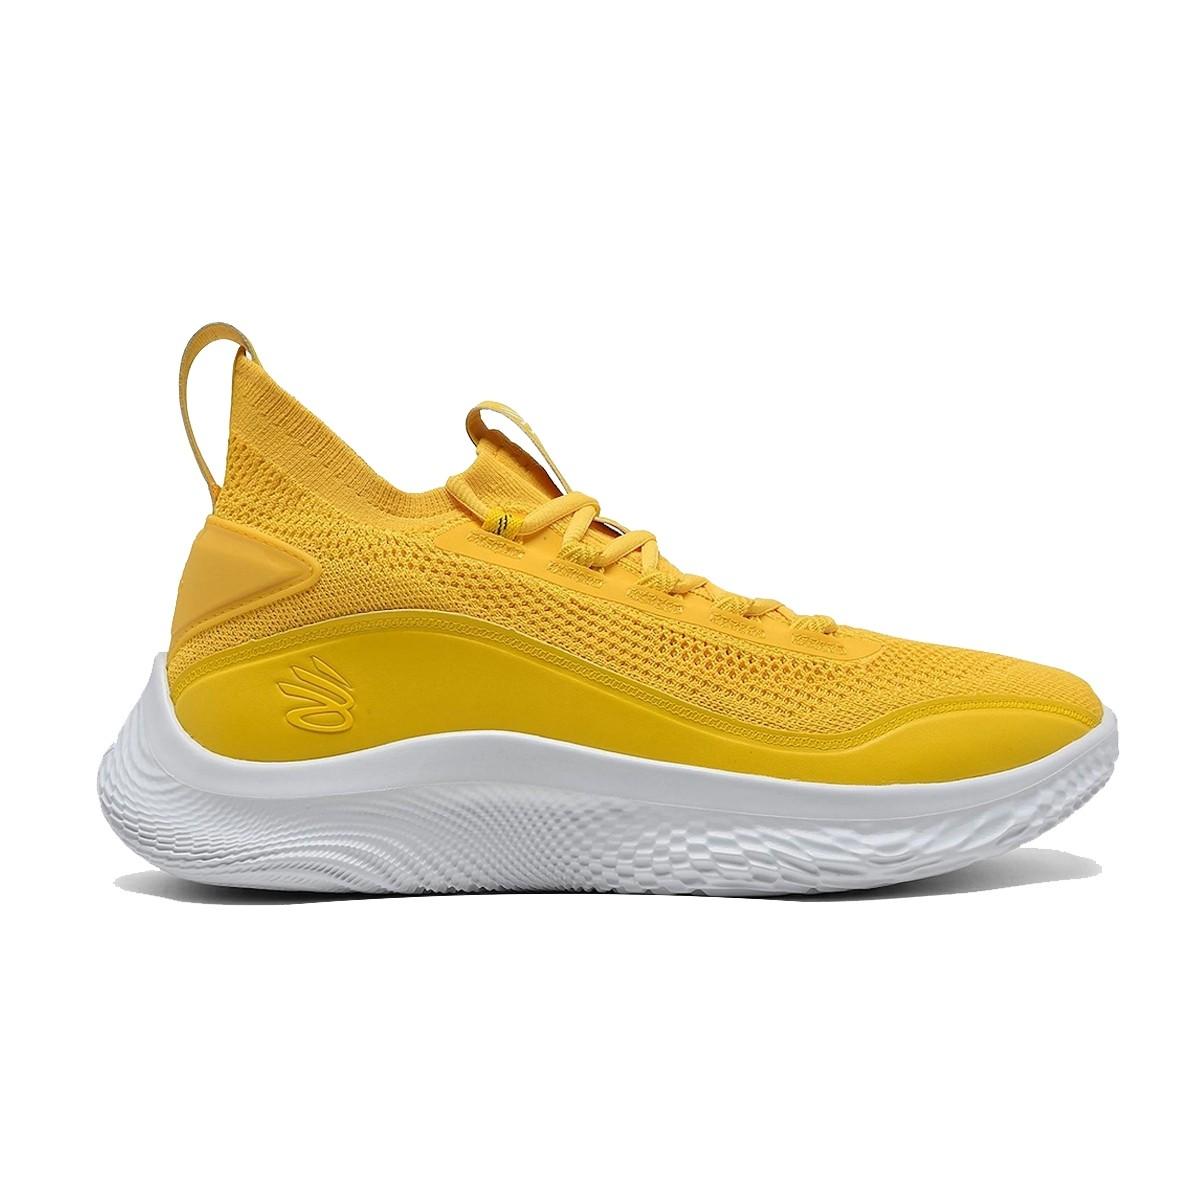 UA Curry 8 'Popcorn'